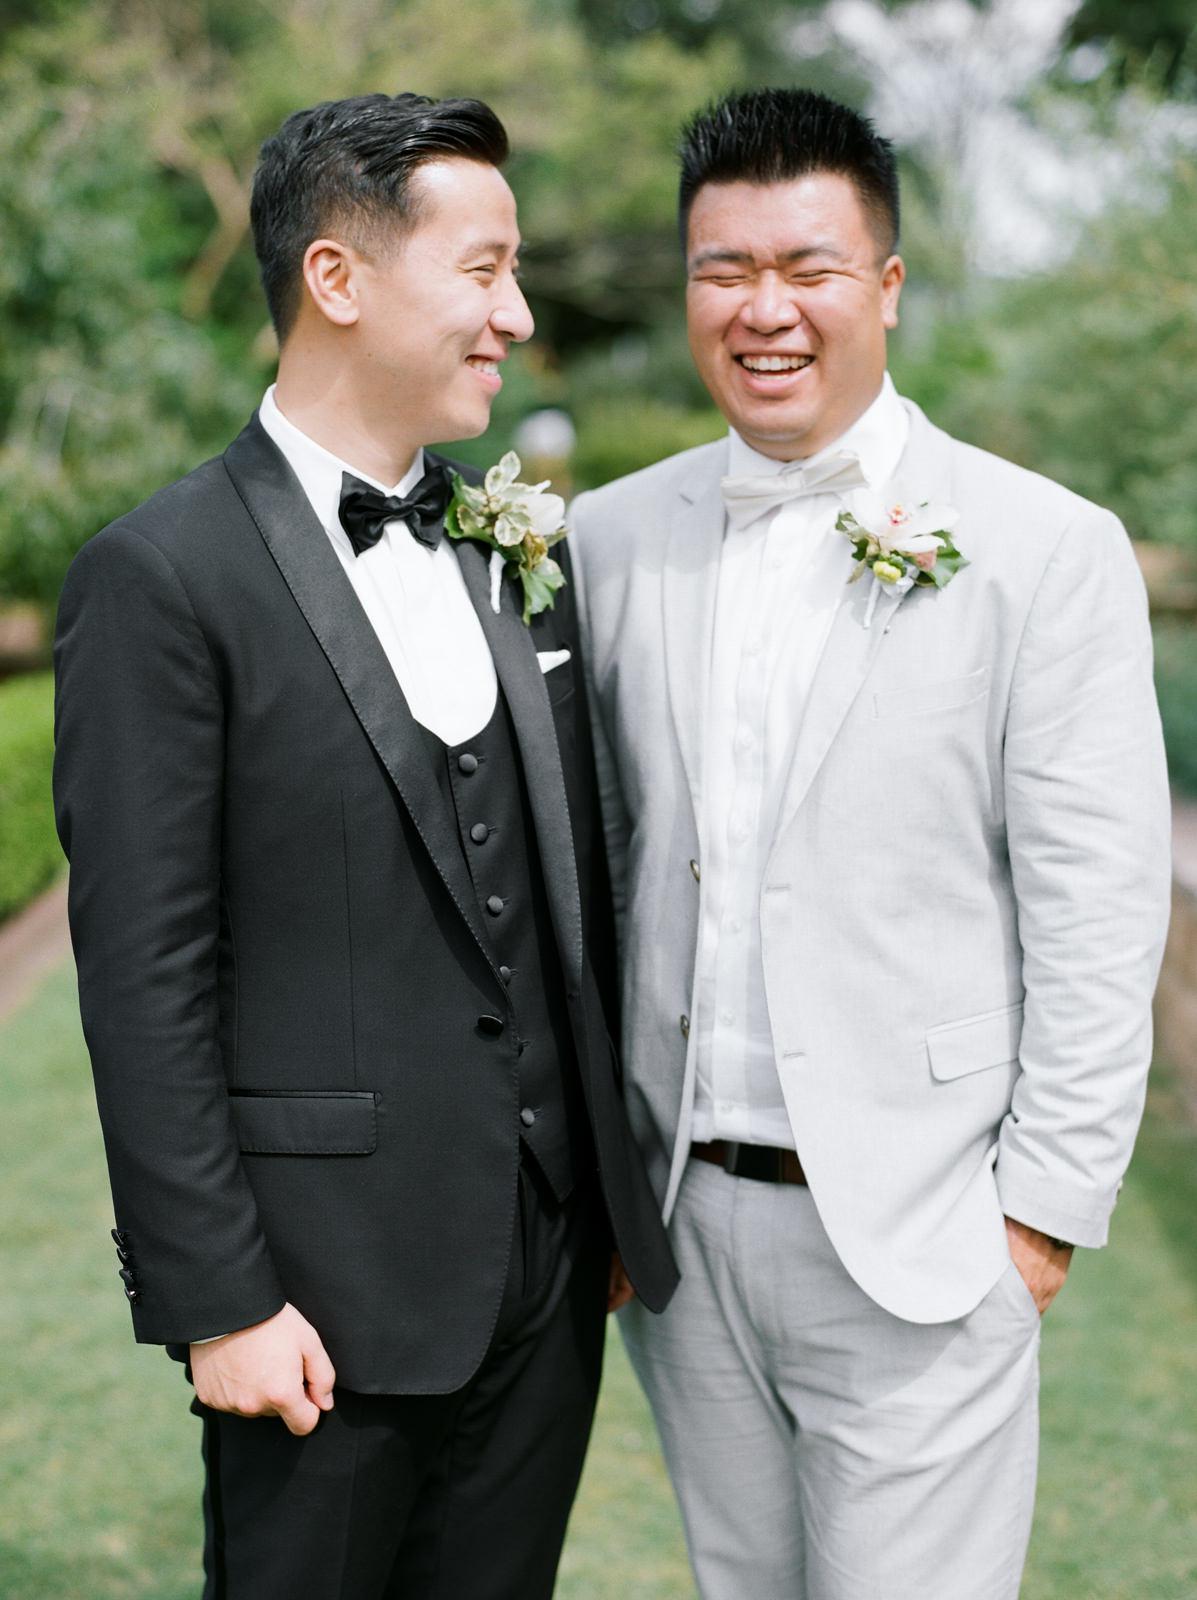 waop_jennifer&david_wedding-0498.jpg